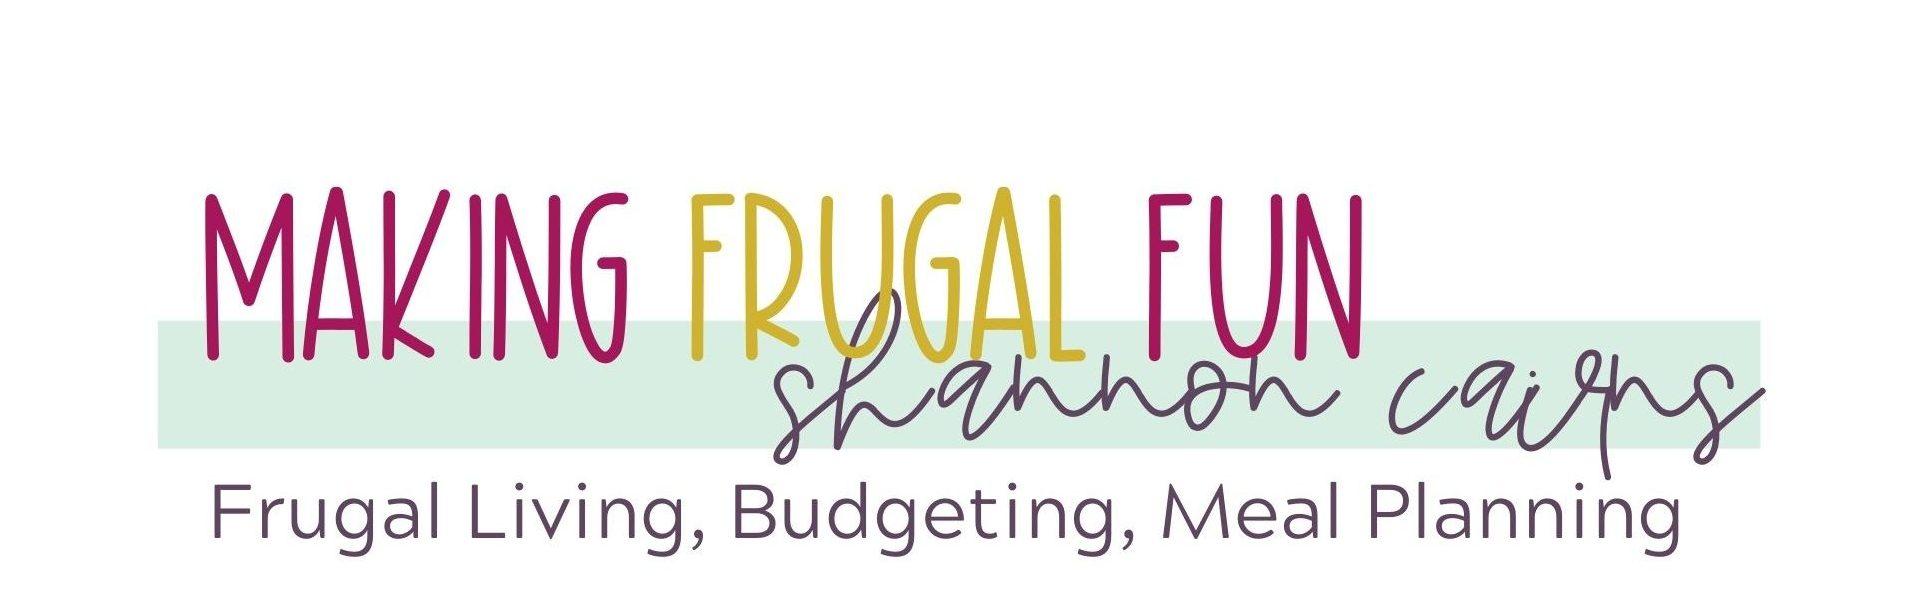 Making Frugal FUN